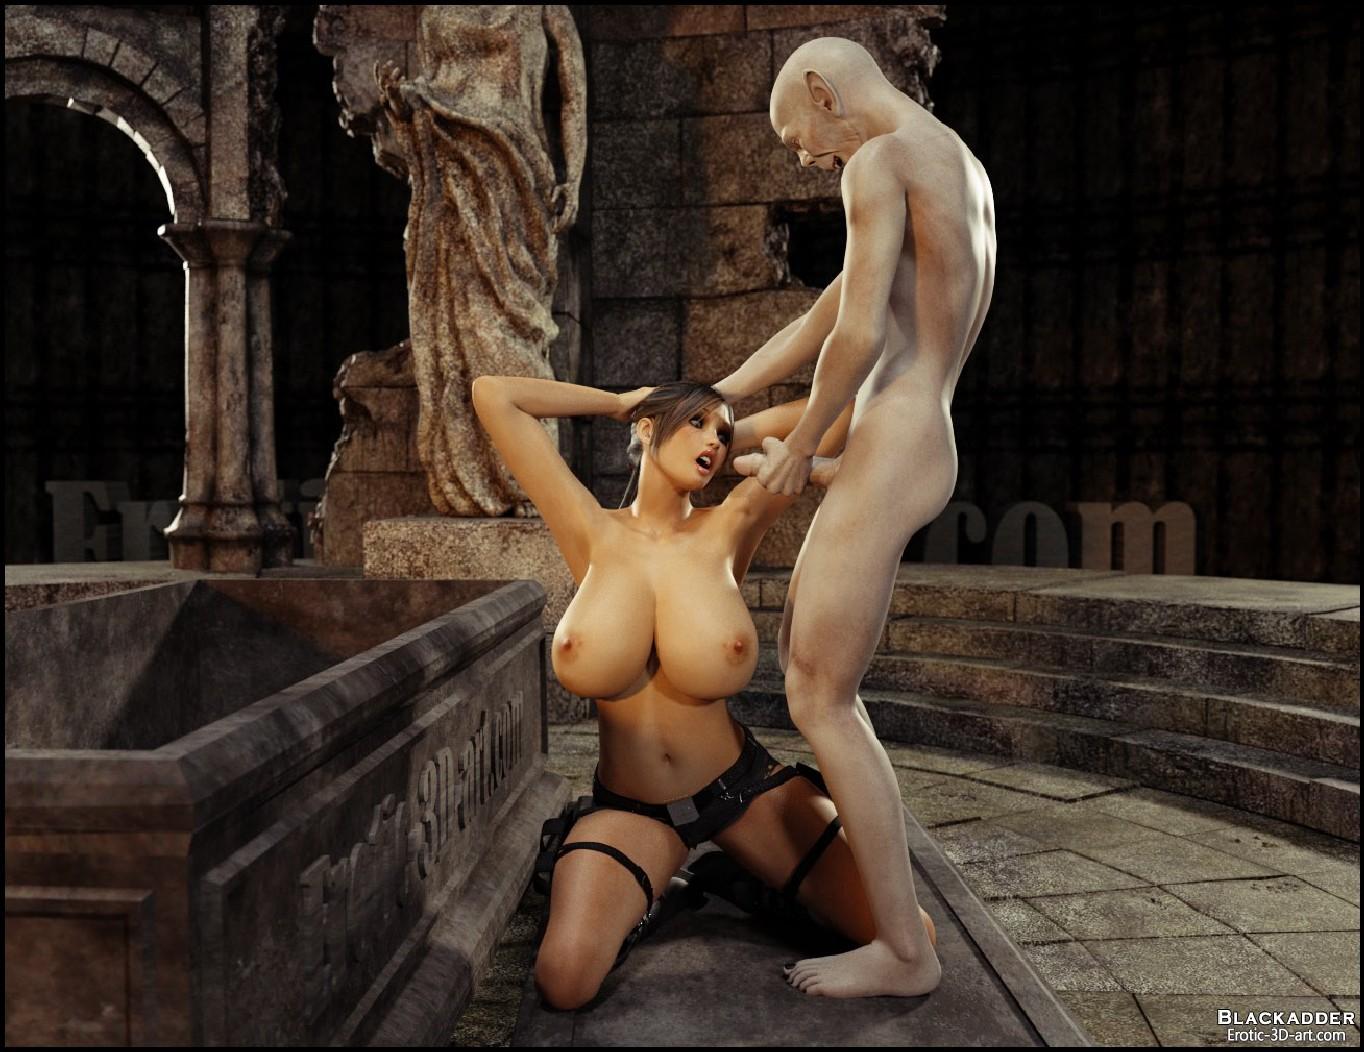 3dsexsins monsters fuck busty girl sexy photos